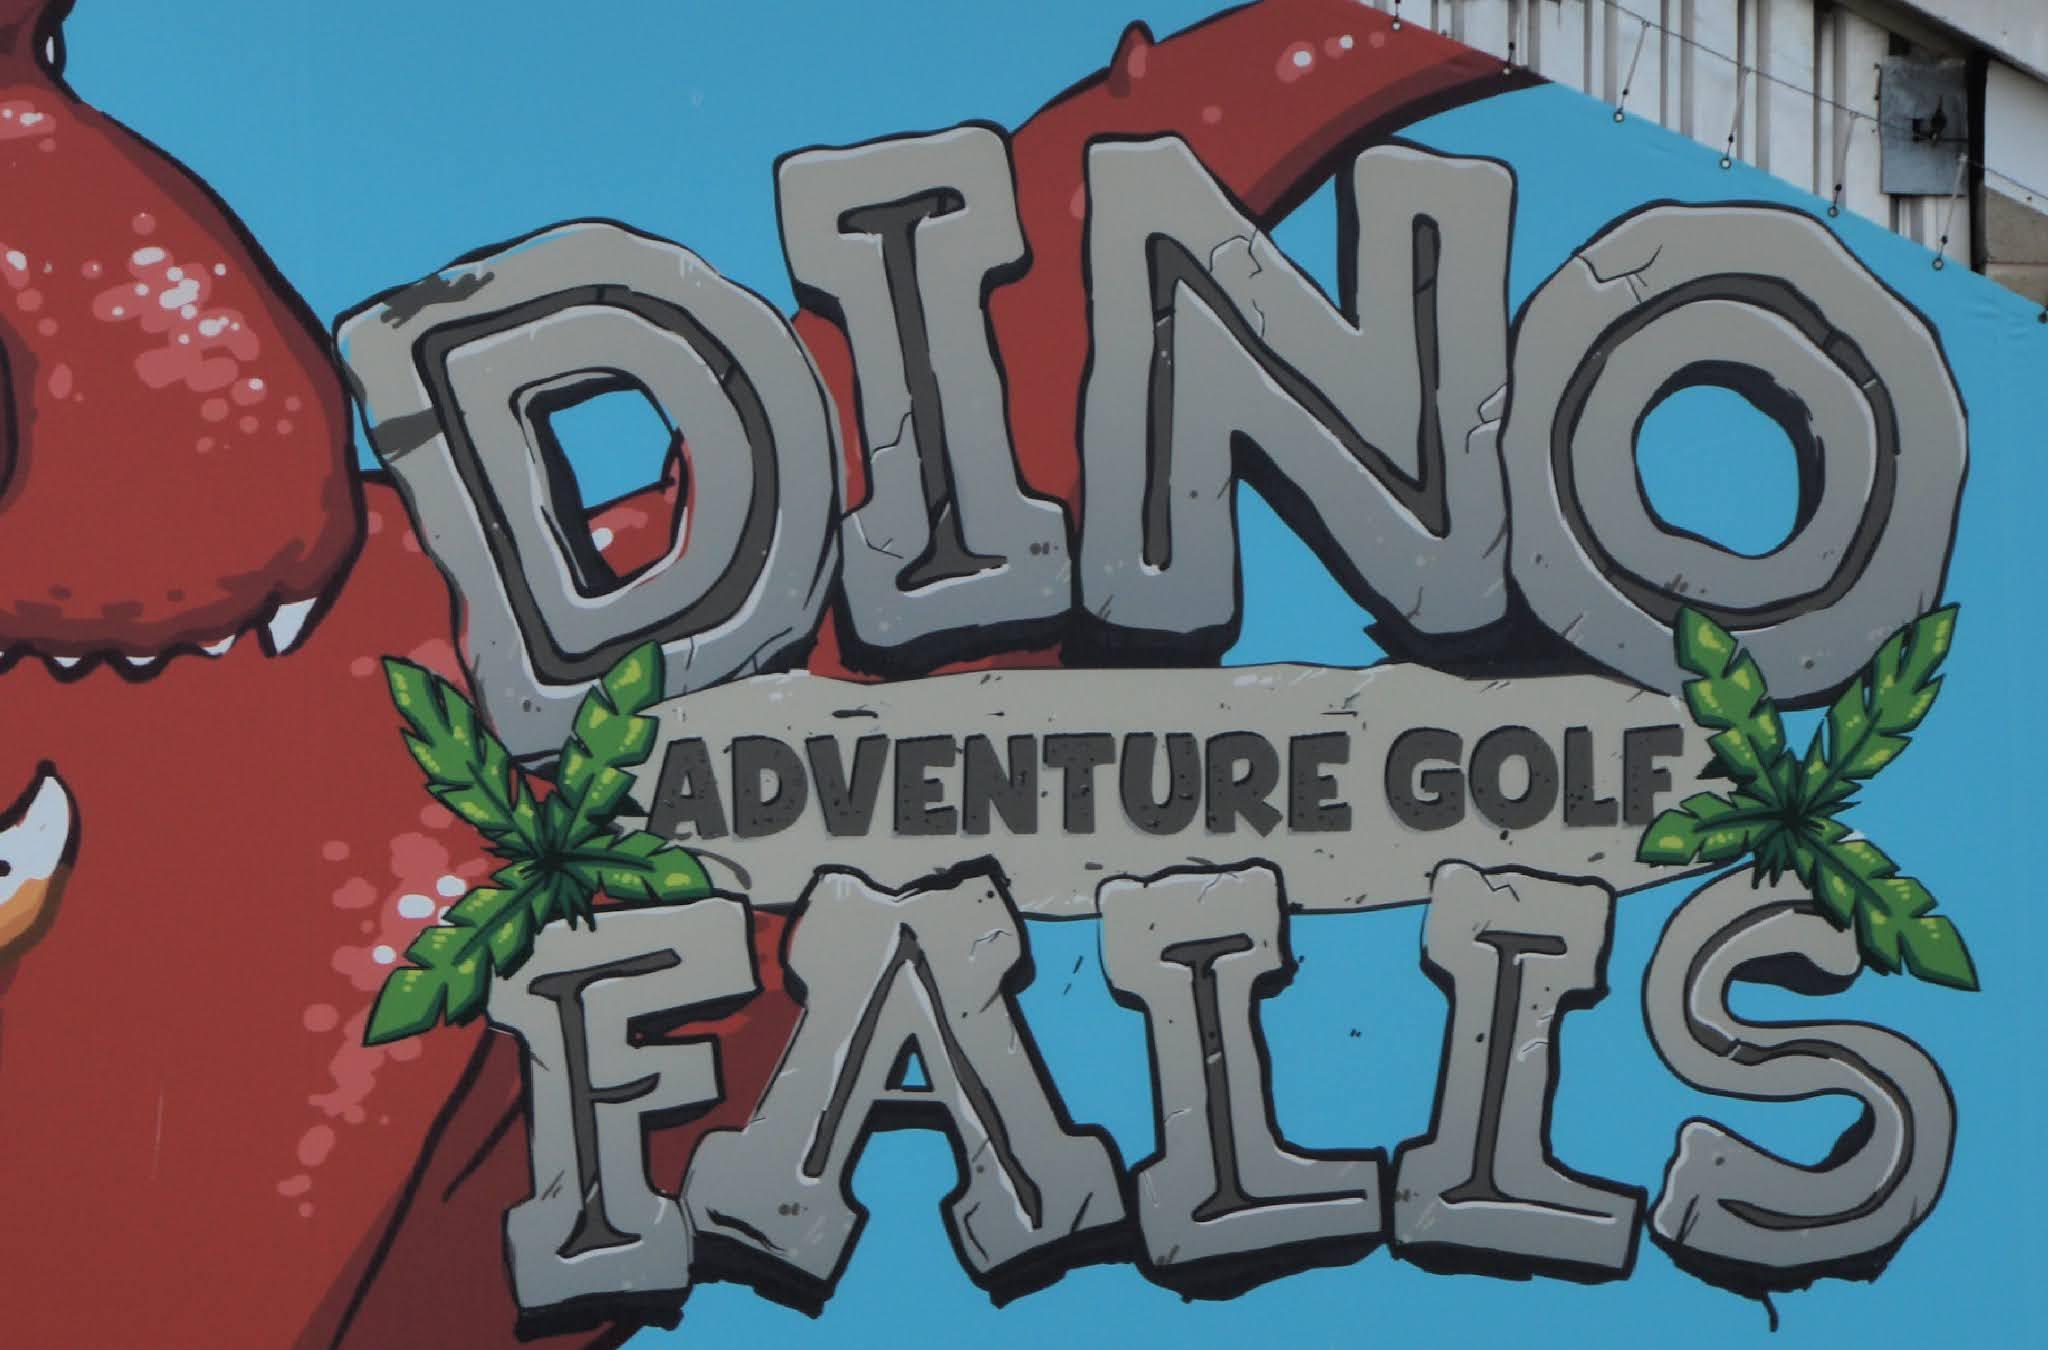 Dino Falls sign